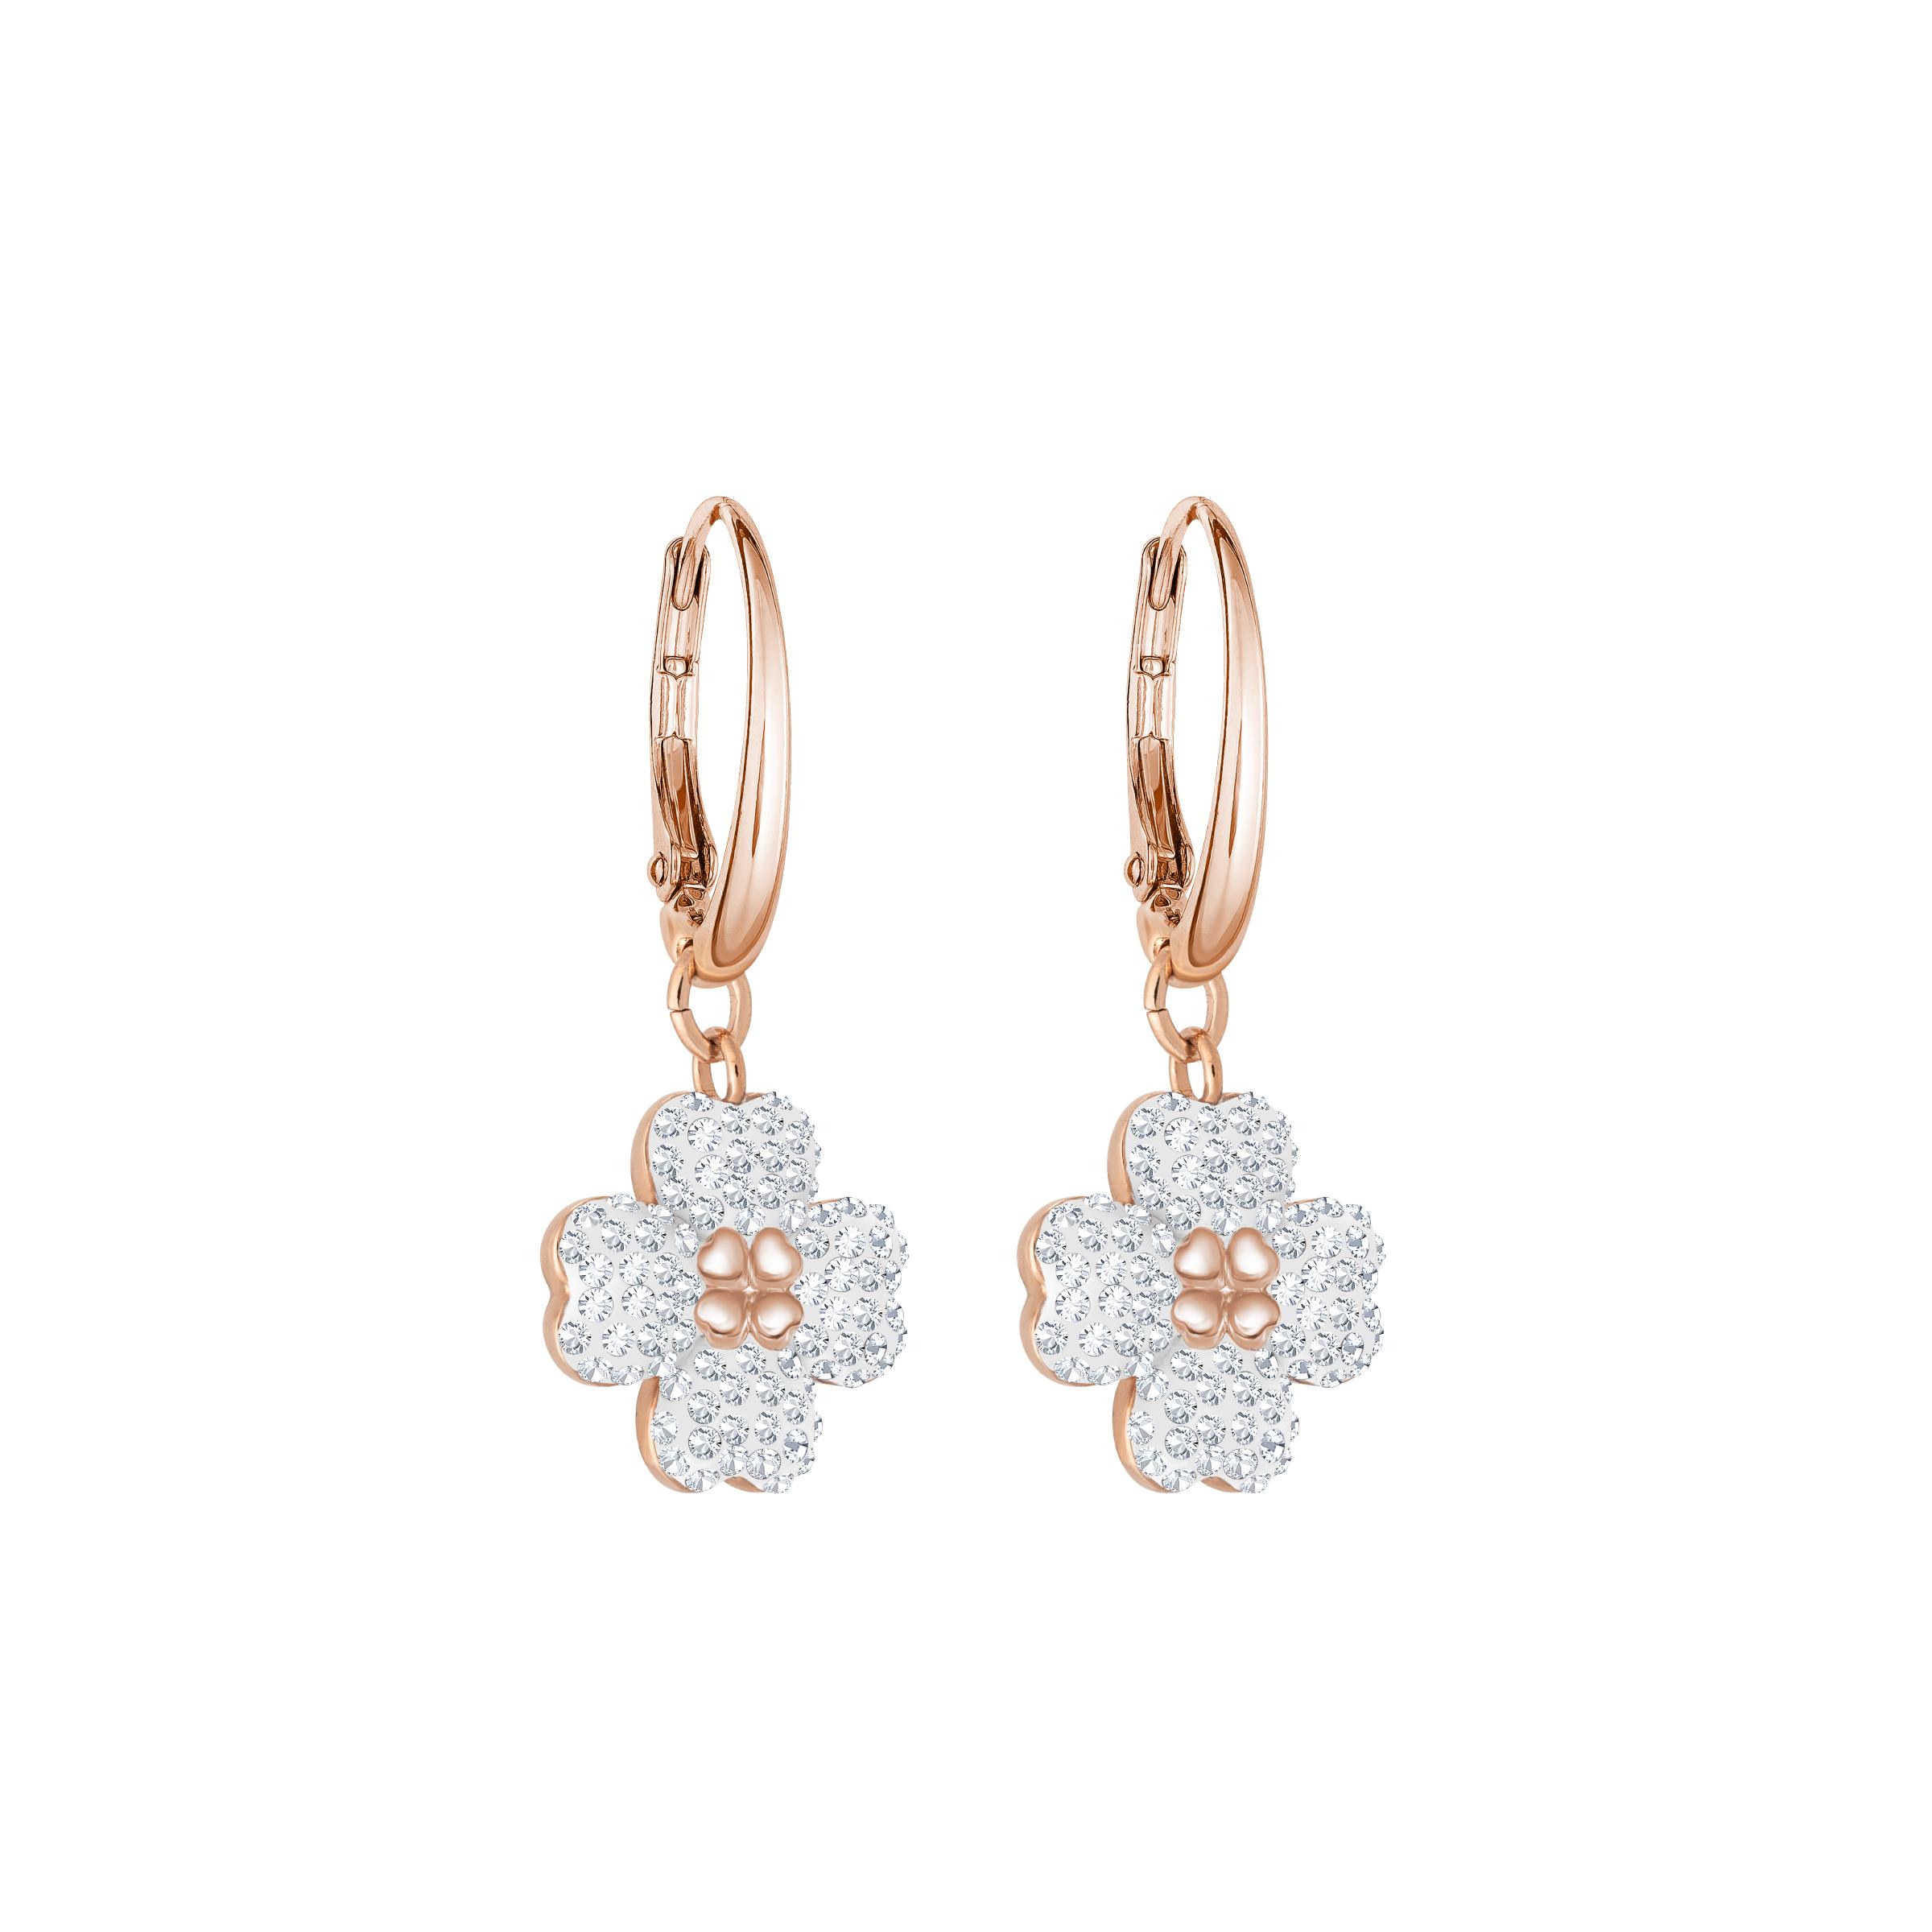 Latisha Pierced Earrings, White, Rose Gold Plating